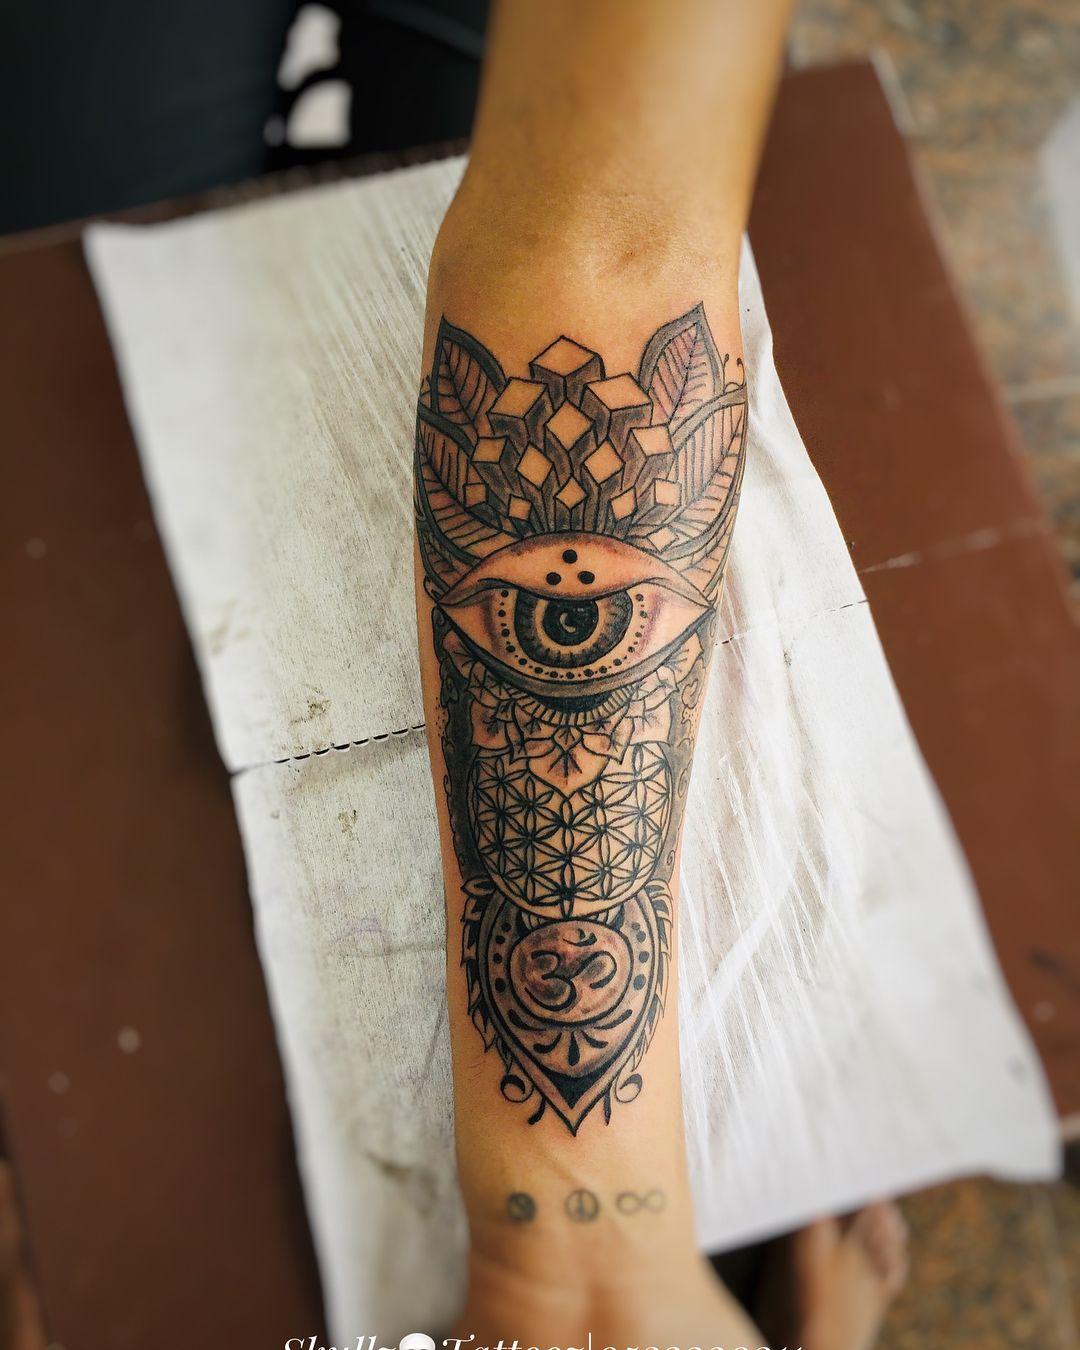 Mandala tattoo done at skullz tattooz using cheyenne